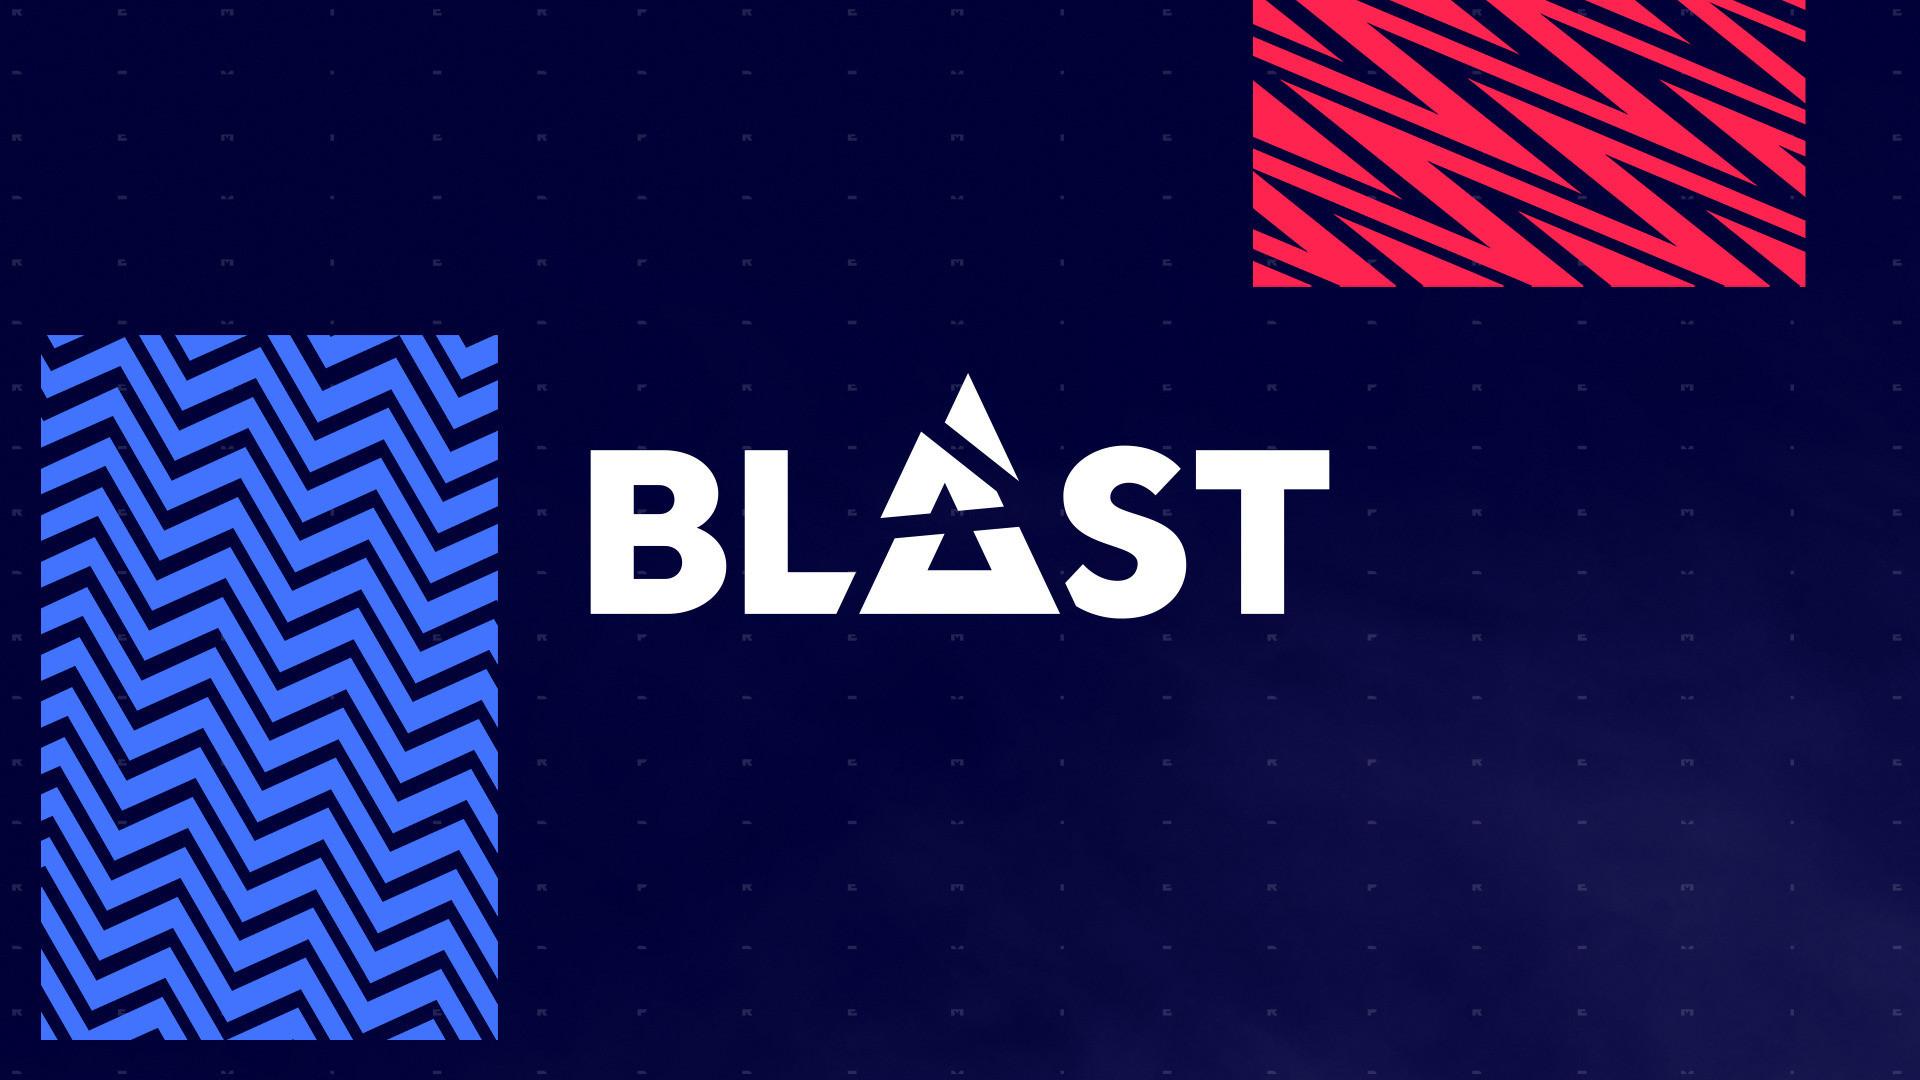 BLAST Premier Fall : FURIA et mouz qualifiés